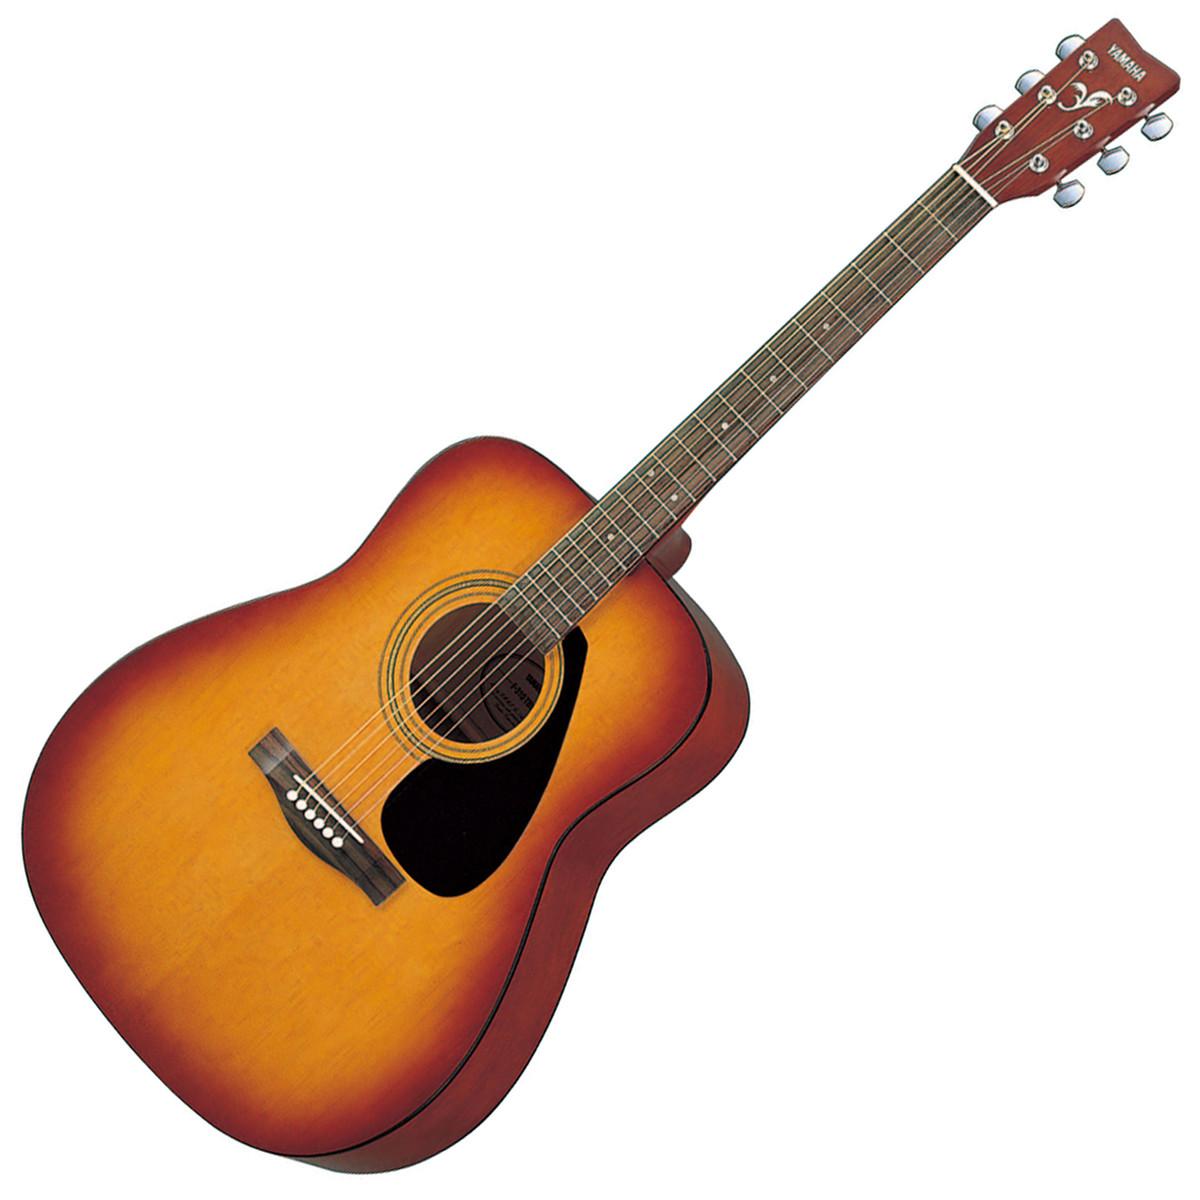 Yamaha f310 acoustic guitar tobacco brown sunburst ex for Yamaha fs 310 guitar